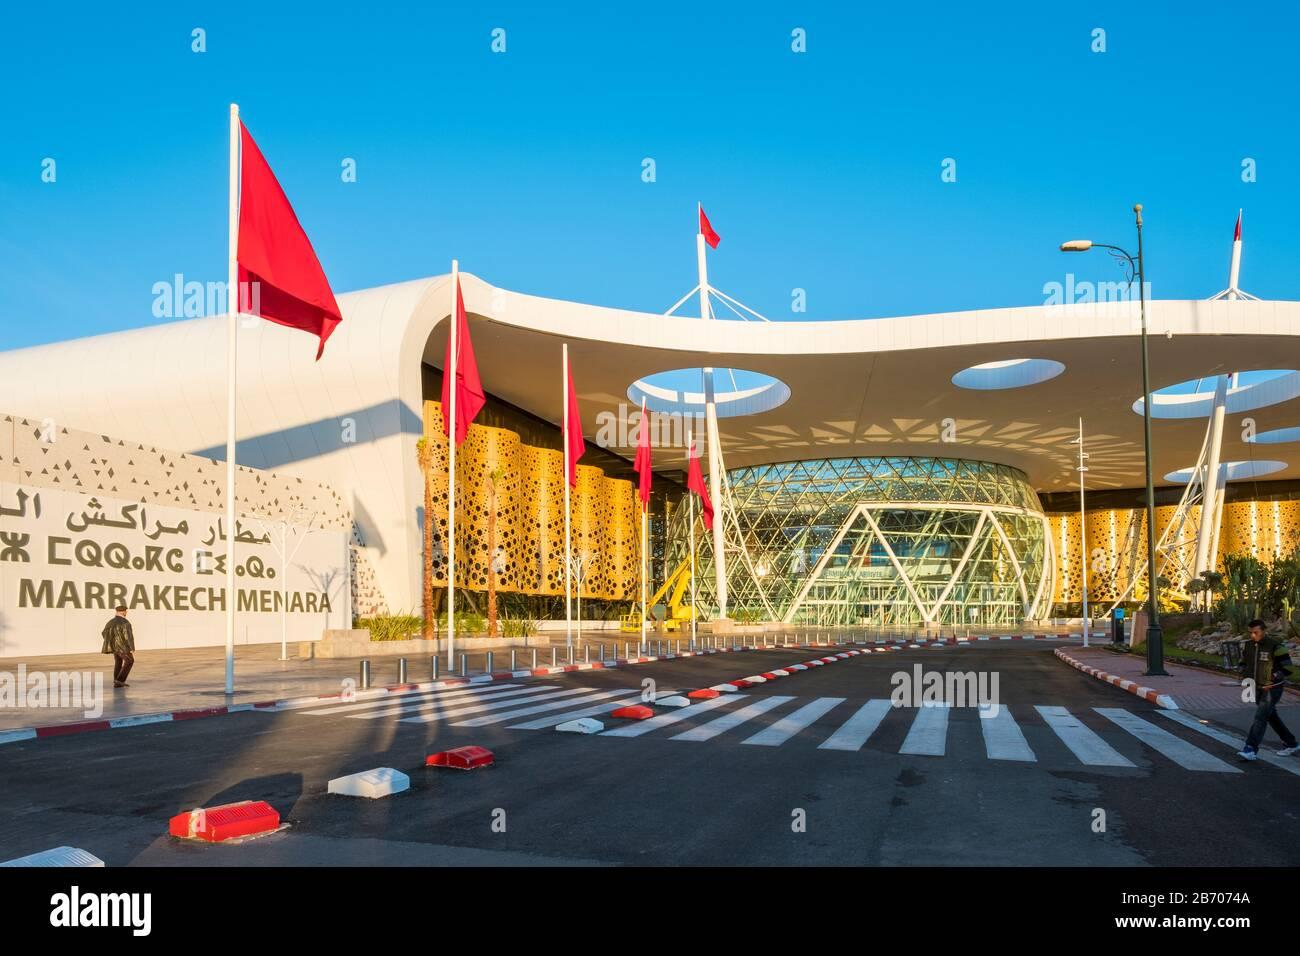 Marocco, Marrakech-Safi (Marrakech-Tensift-El Haouz), Marrakech. Terminal dell'aeroporto di Marrakech Menara. Foto Stock